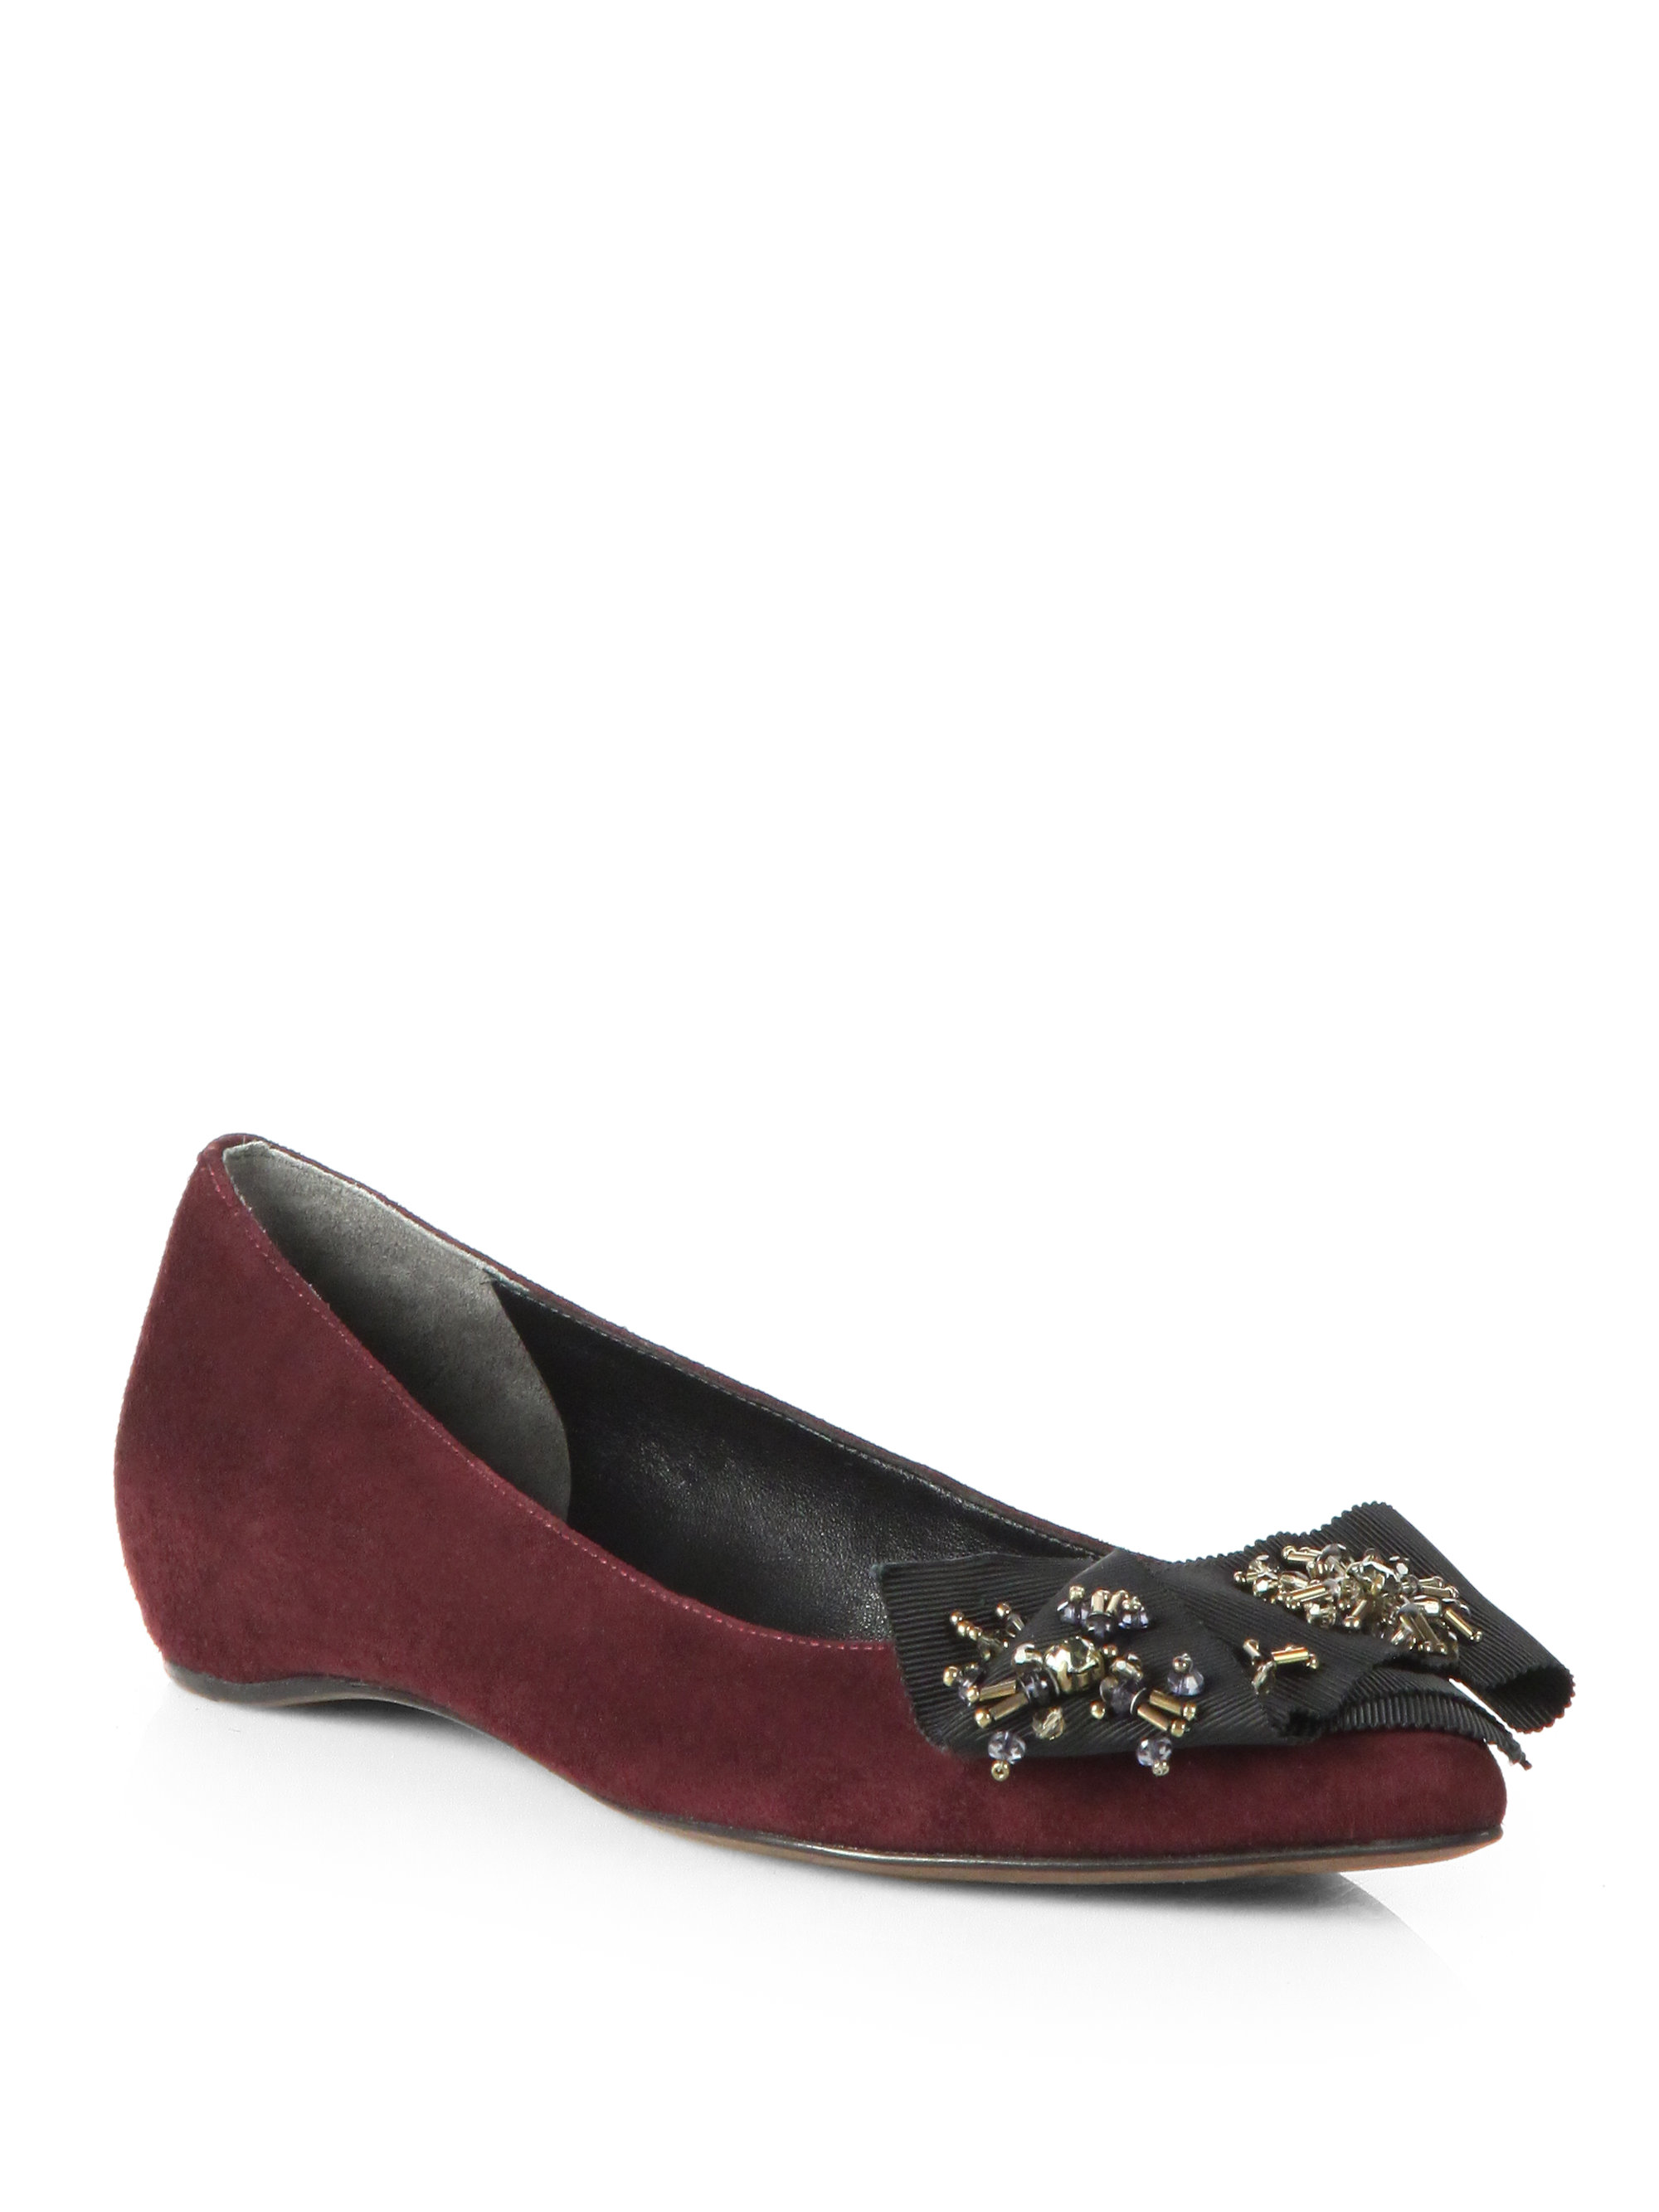 Vera Wang Lavender Flats Shoes